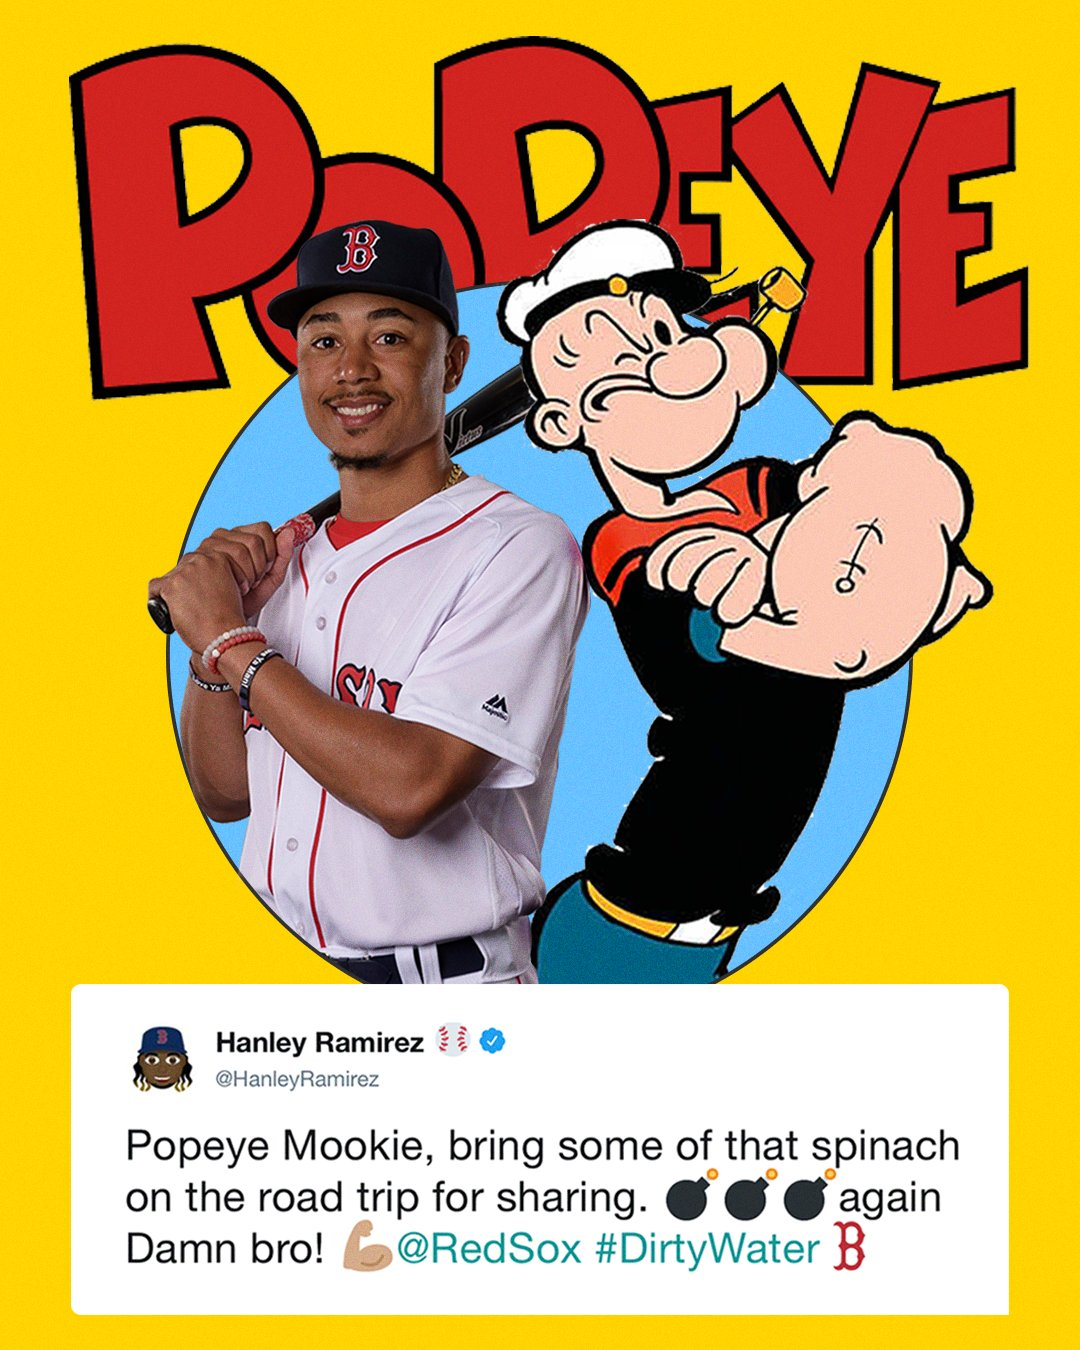 Mookie Betts = Popeye? Hanley Ramirez thinks so �� https://t.co/dAS9uIfNdB